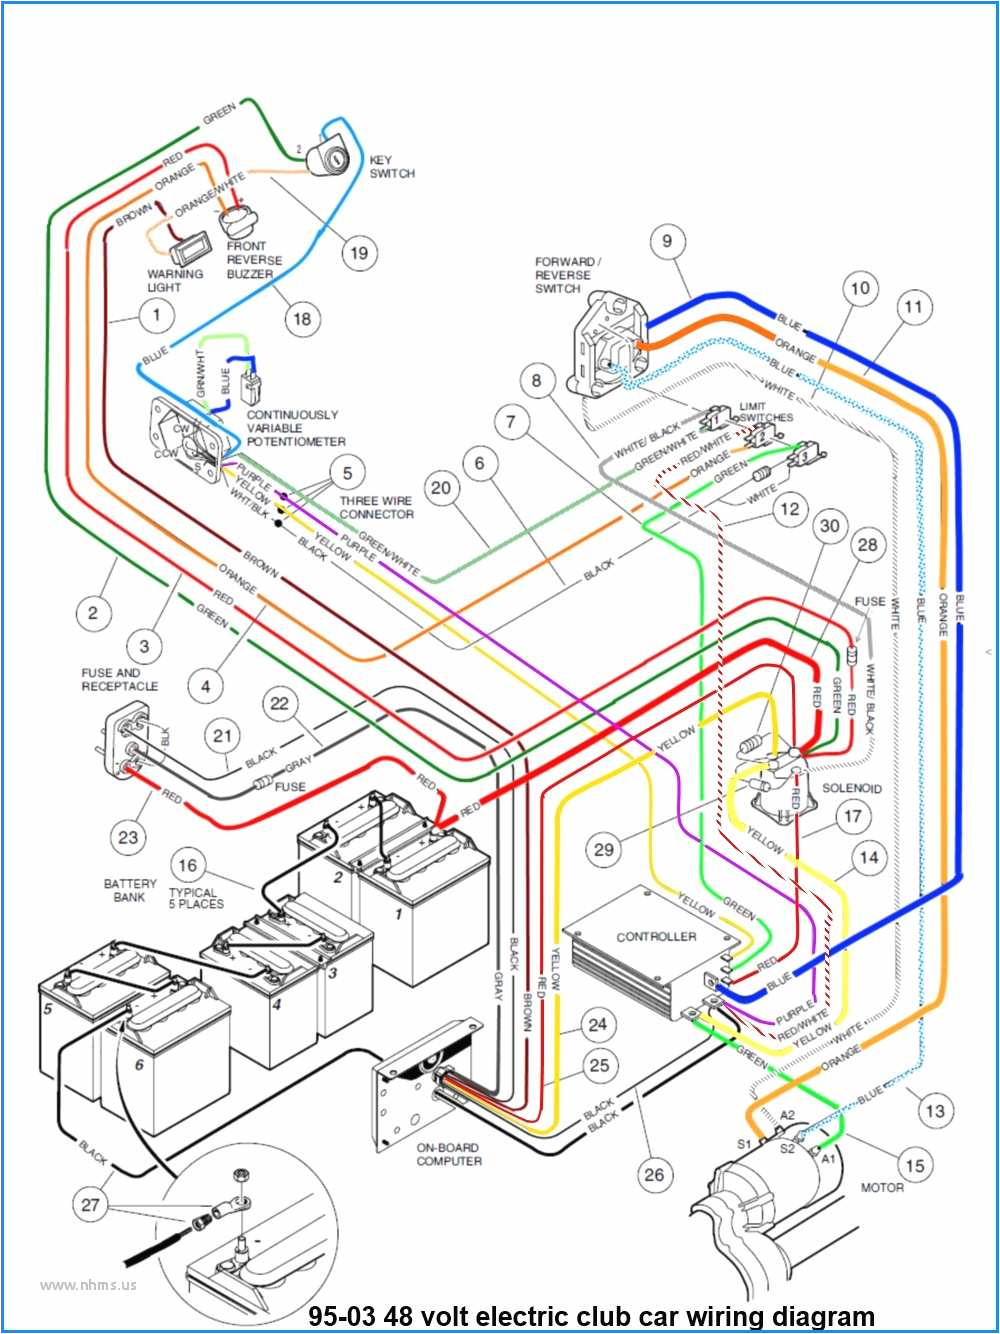 1990 club car wiring diagram wiring diagram user 1990 club car battery wiring diagram 36 volt 1990 club car wiring diagram